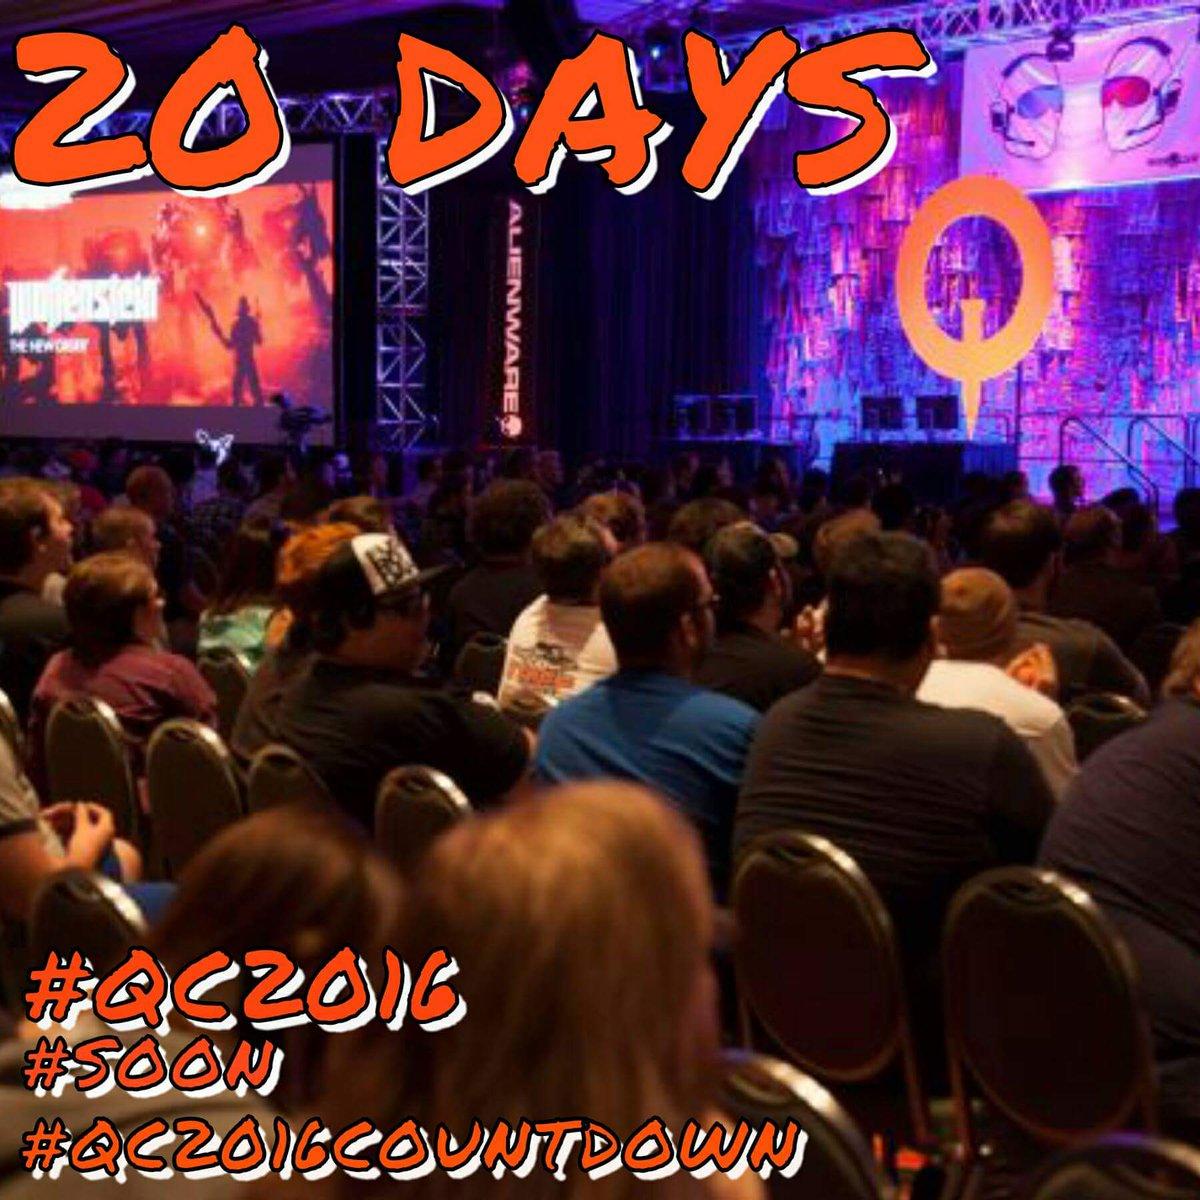 20 DAYS TILL @QuakeCon ! Who ready!? #SOON #qc2016 #quakecon #partycentral @BAWLSGuarana @bethesda @idSoftware https://t.co/i6zGxpMnsG